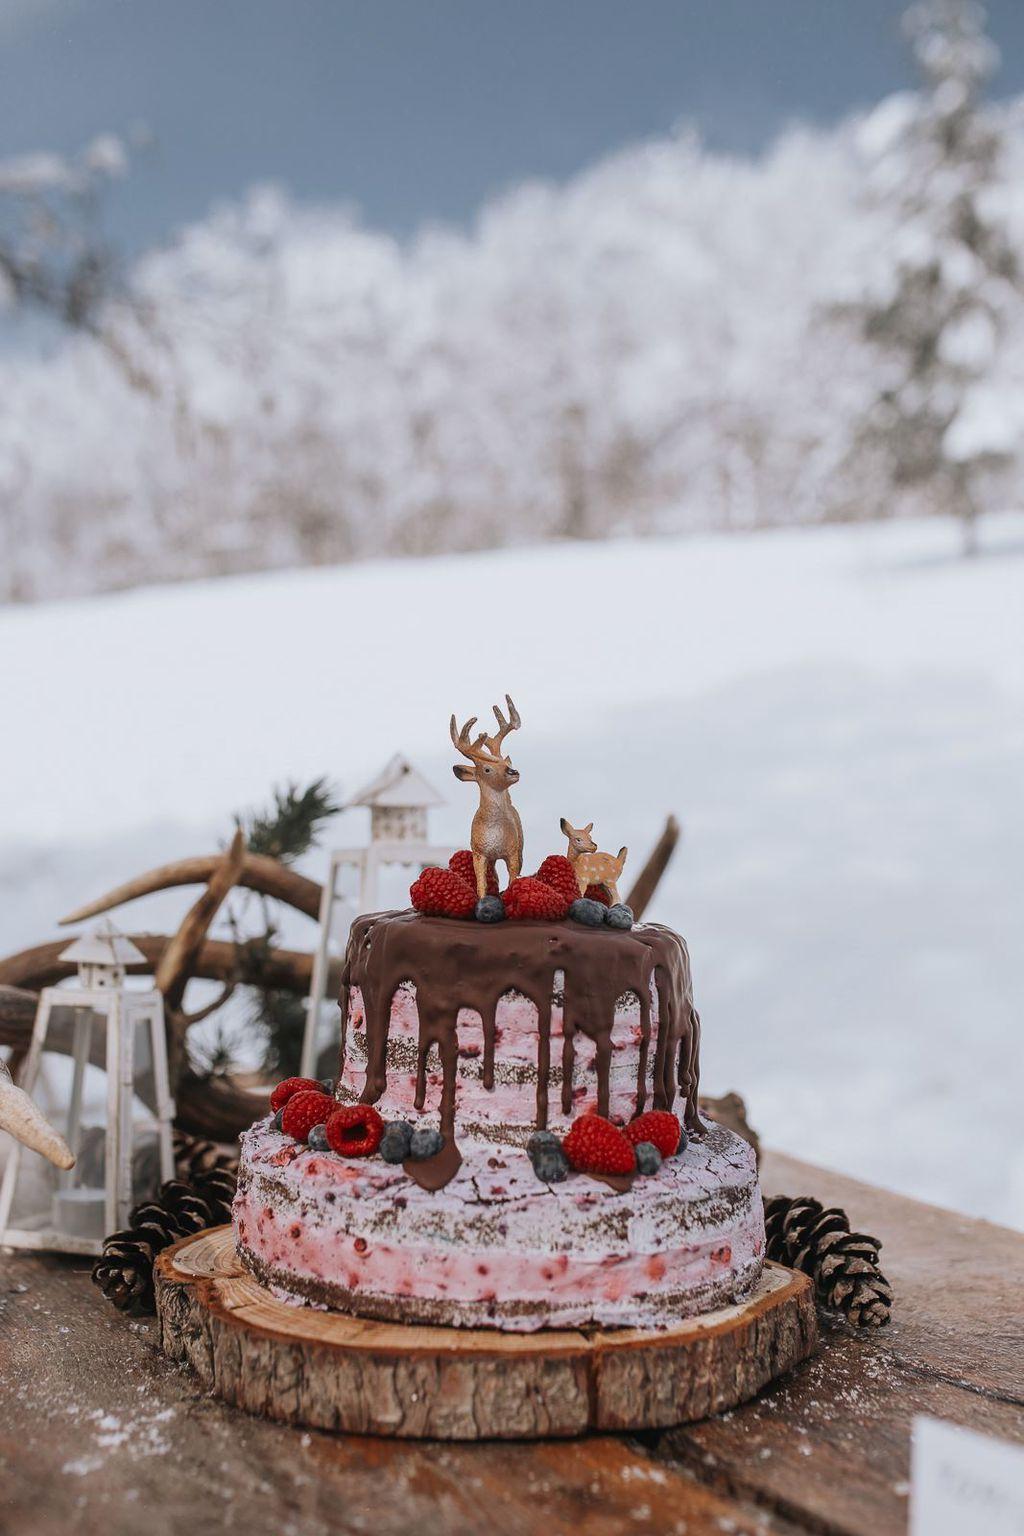 Gola torta s kremom od borovnica